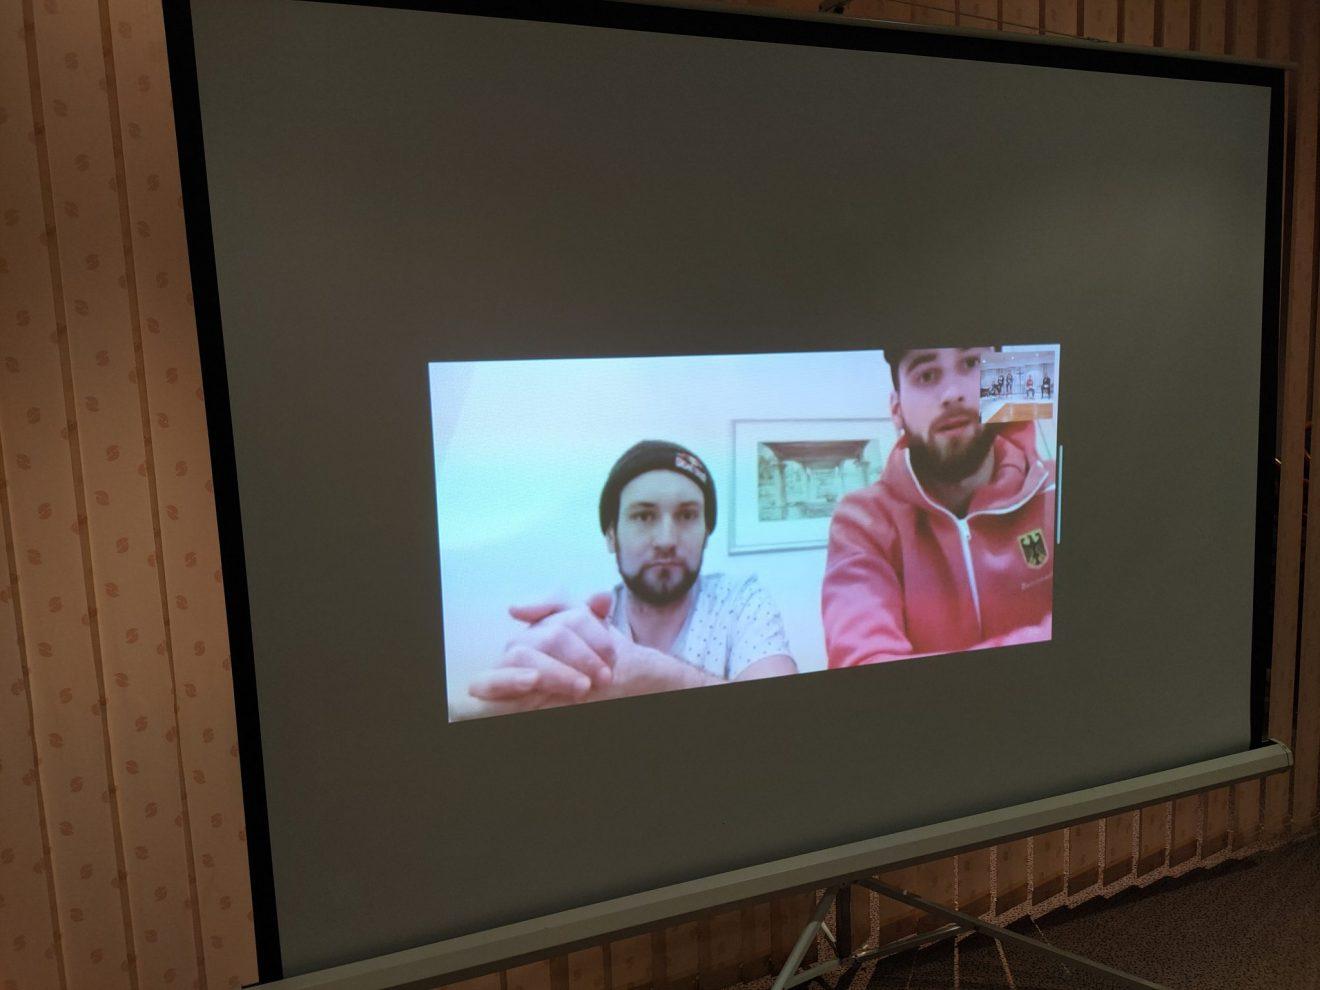 Videomeeting mit den Skullern der A-Nationalmannschaft